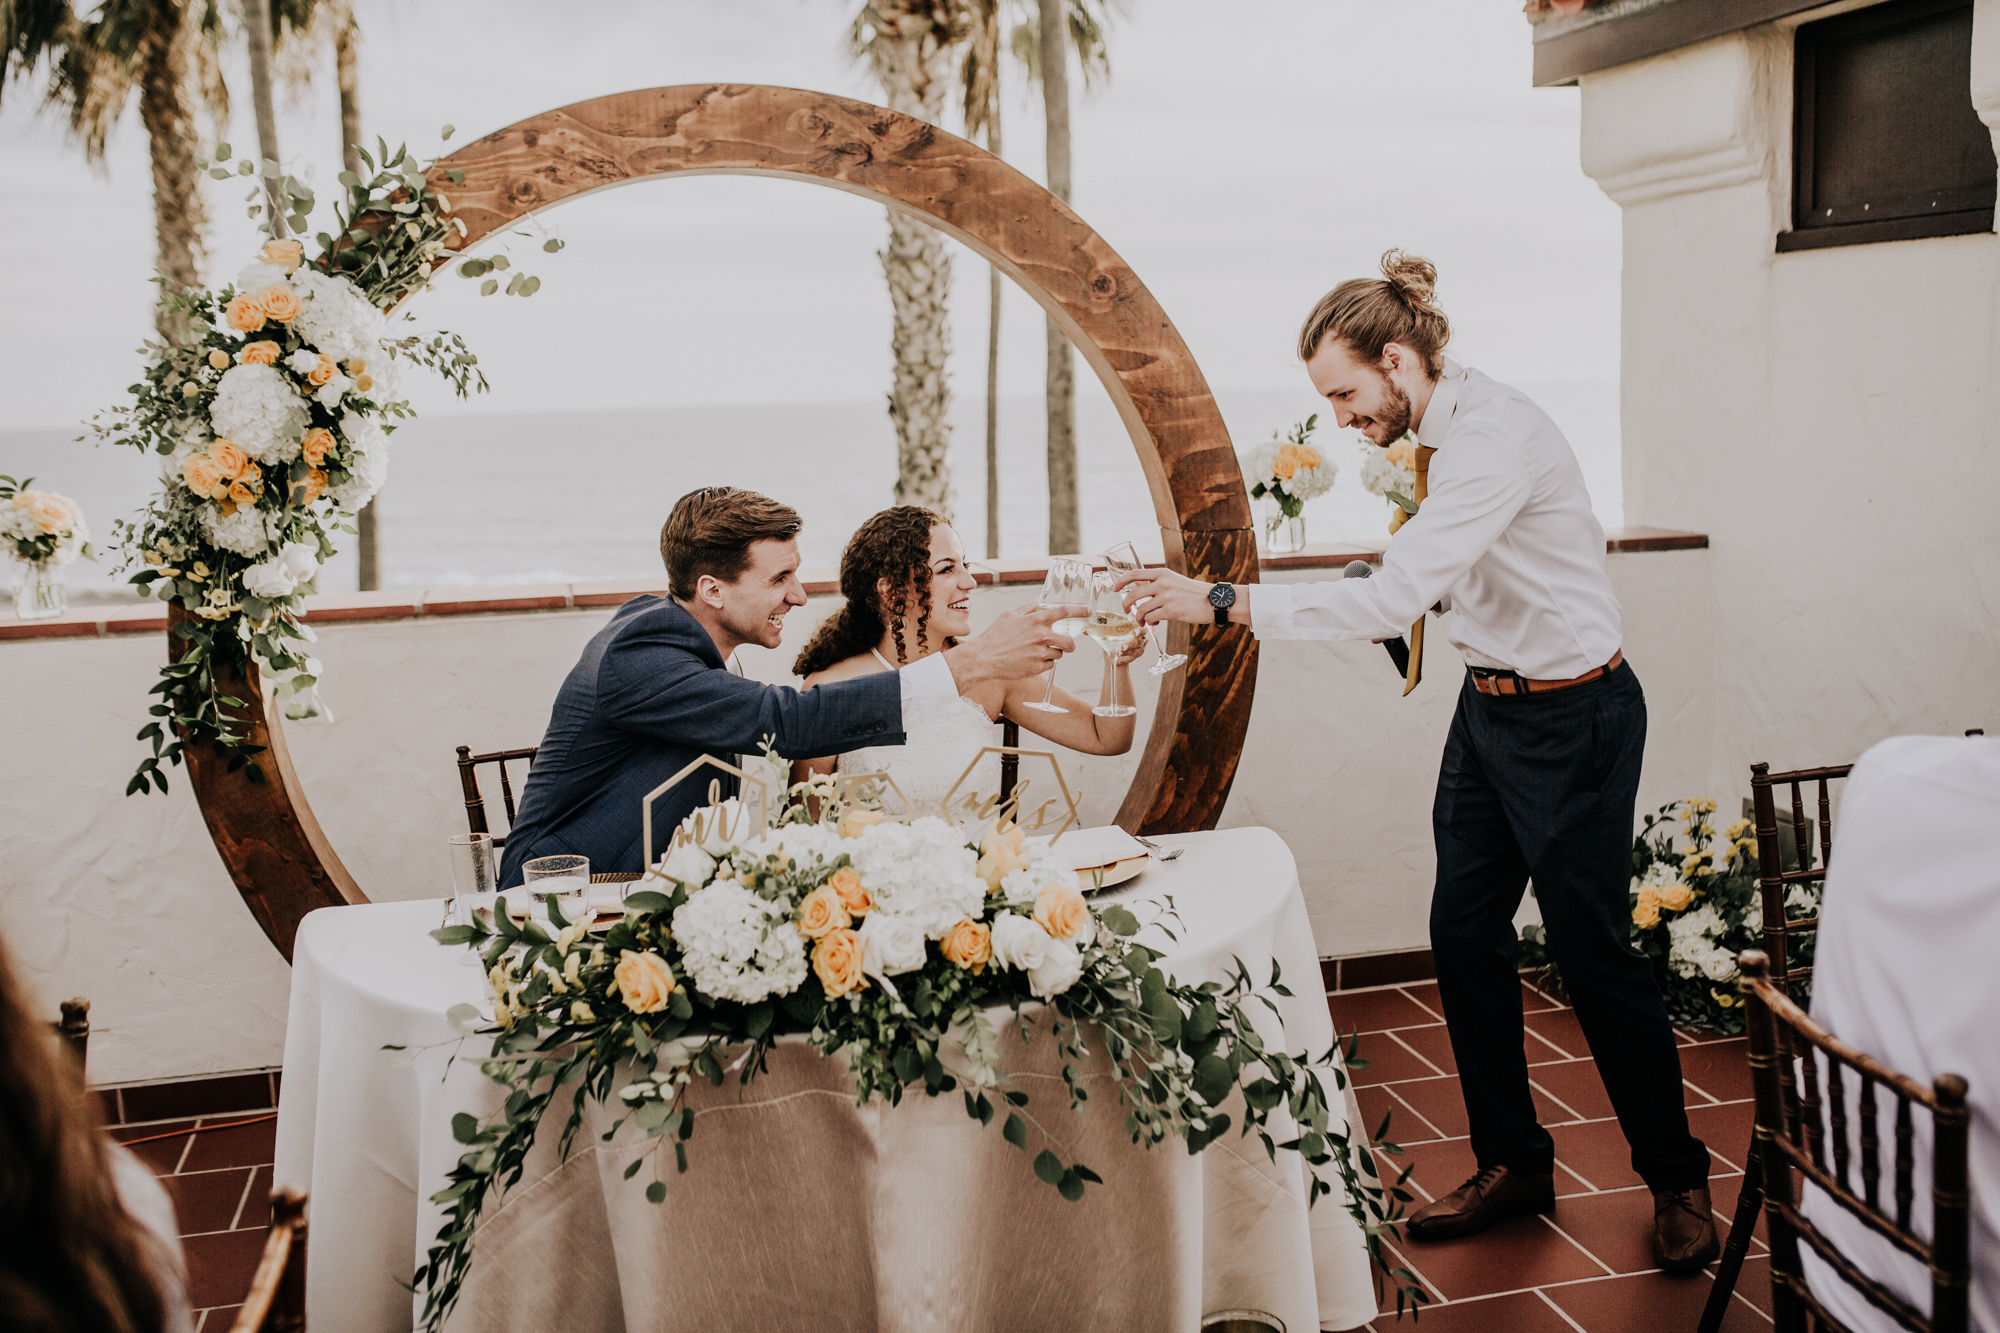 120-destination-wedding-san-clemente-california.jpg